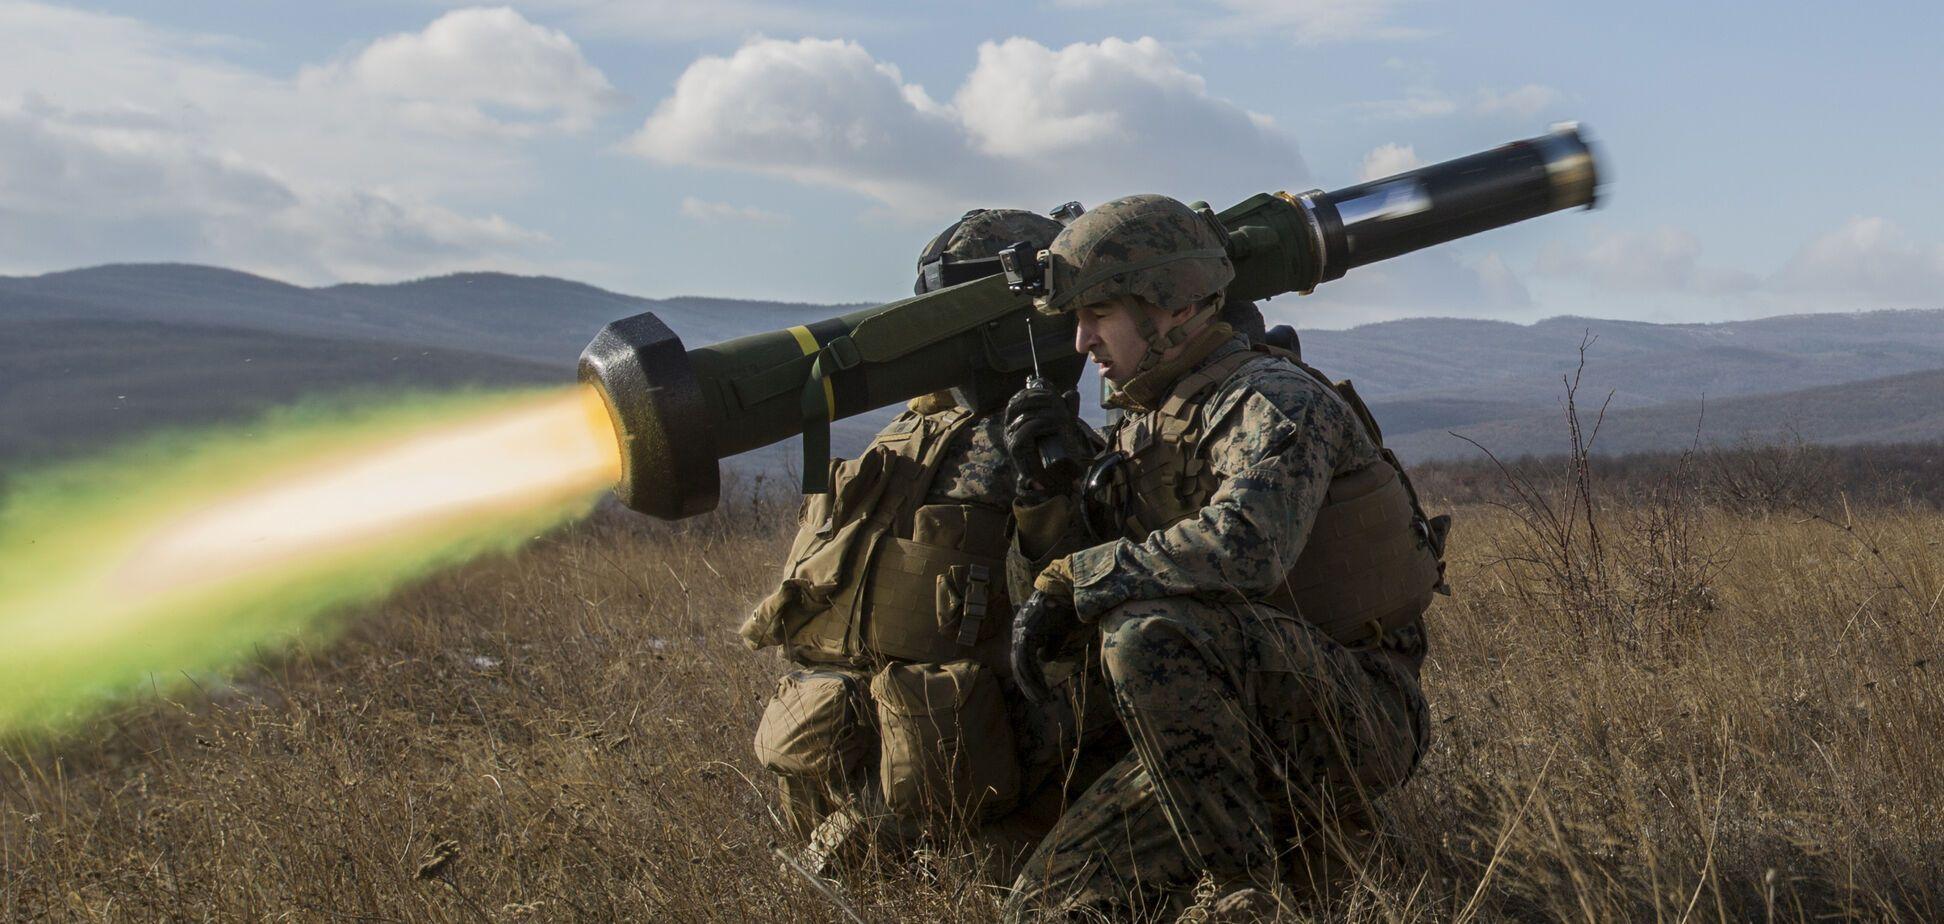 Що Україна отримає при С-300 у Асада: прогноз генерала